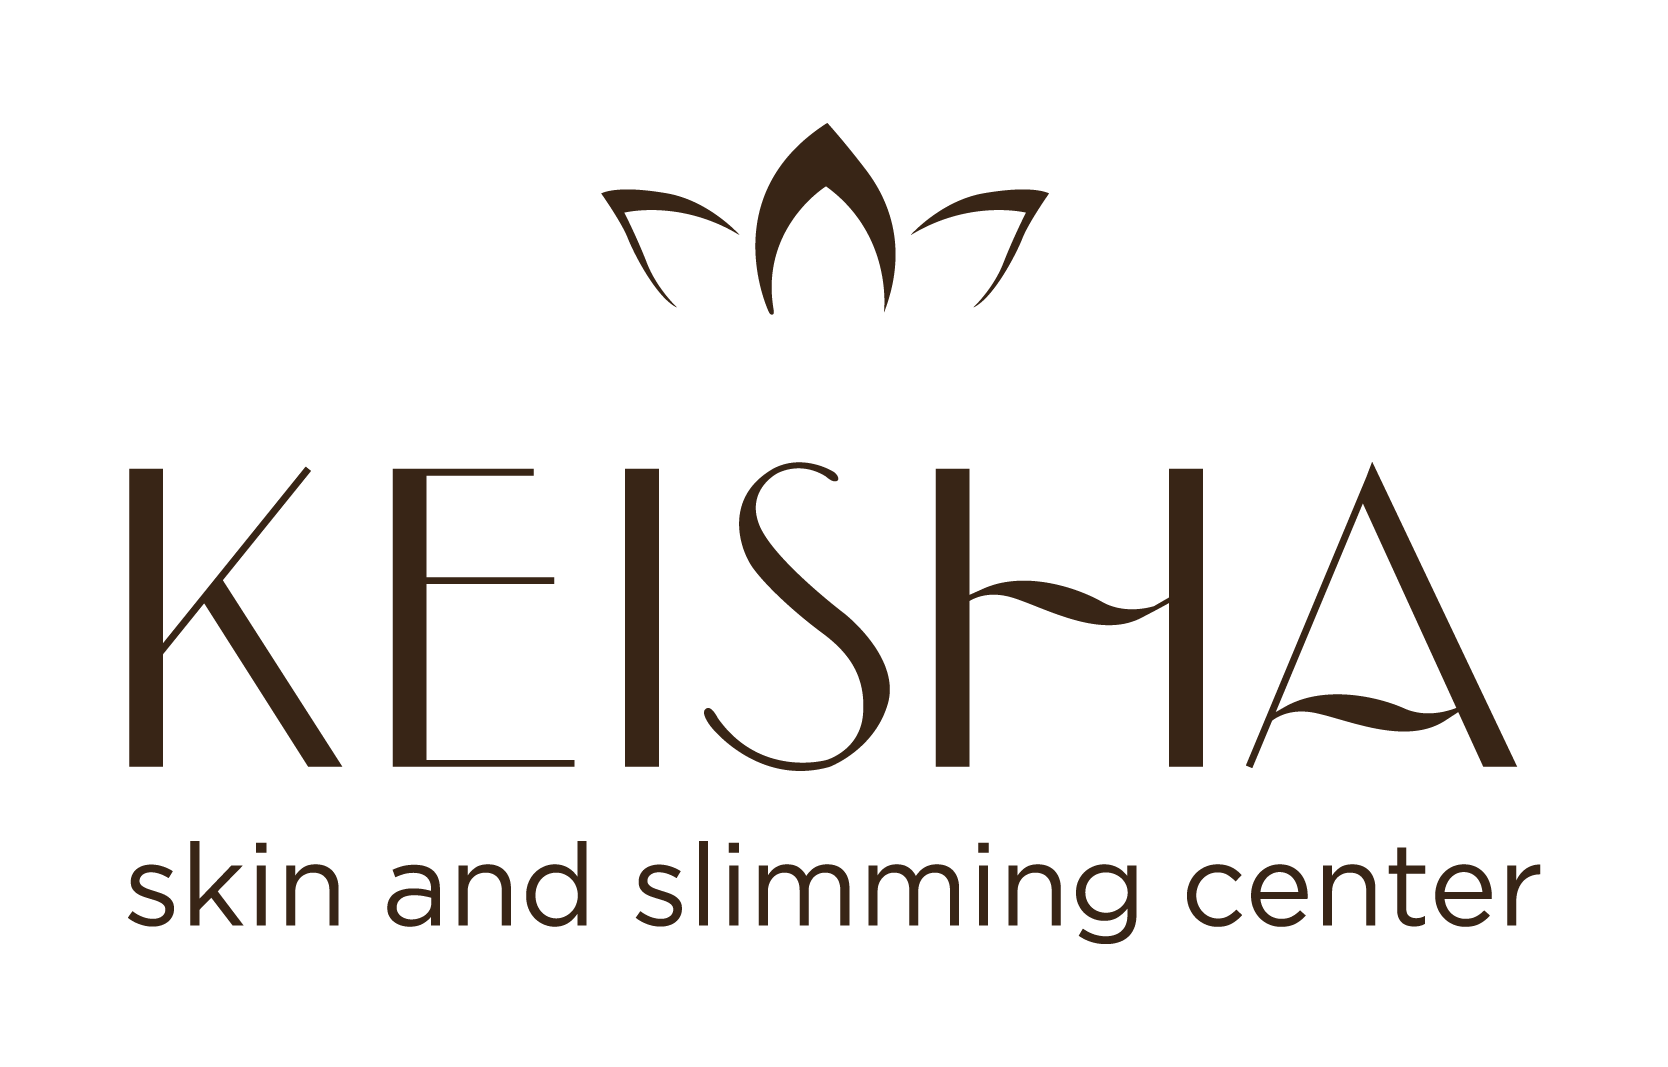 Keisha Skin and slimming center